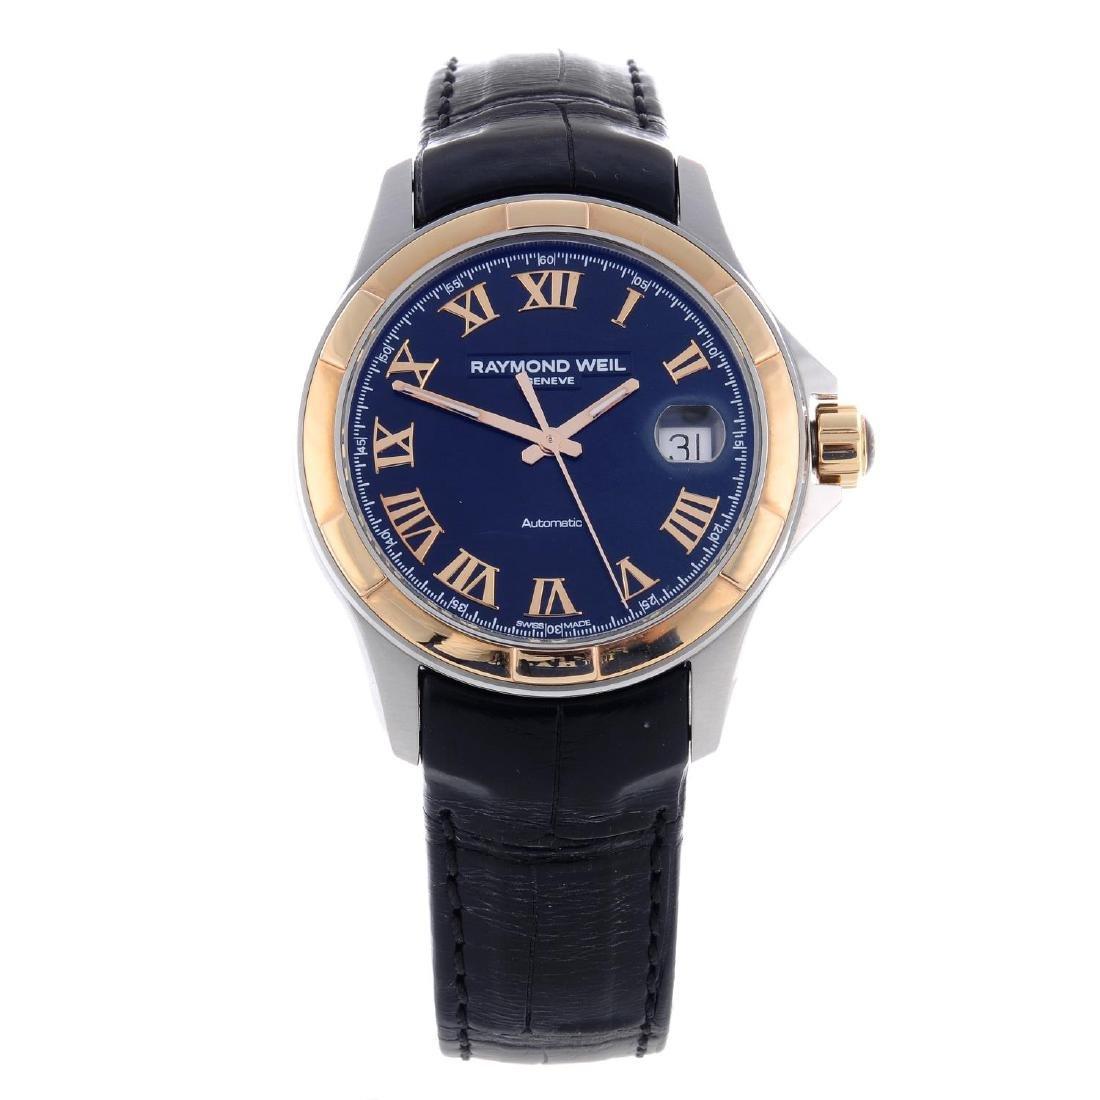 RAYMOND WEIL - a gentleman's Parsifal wrist watch.